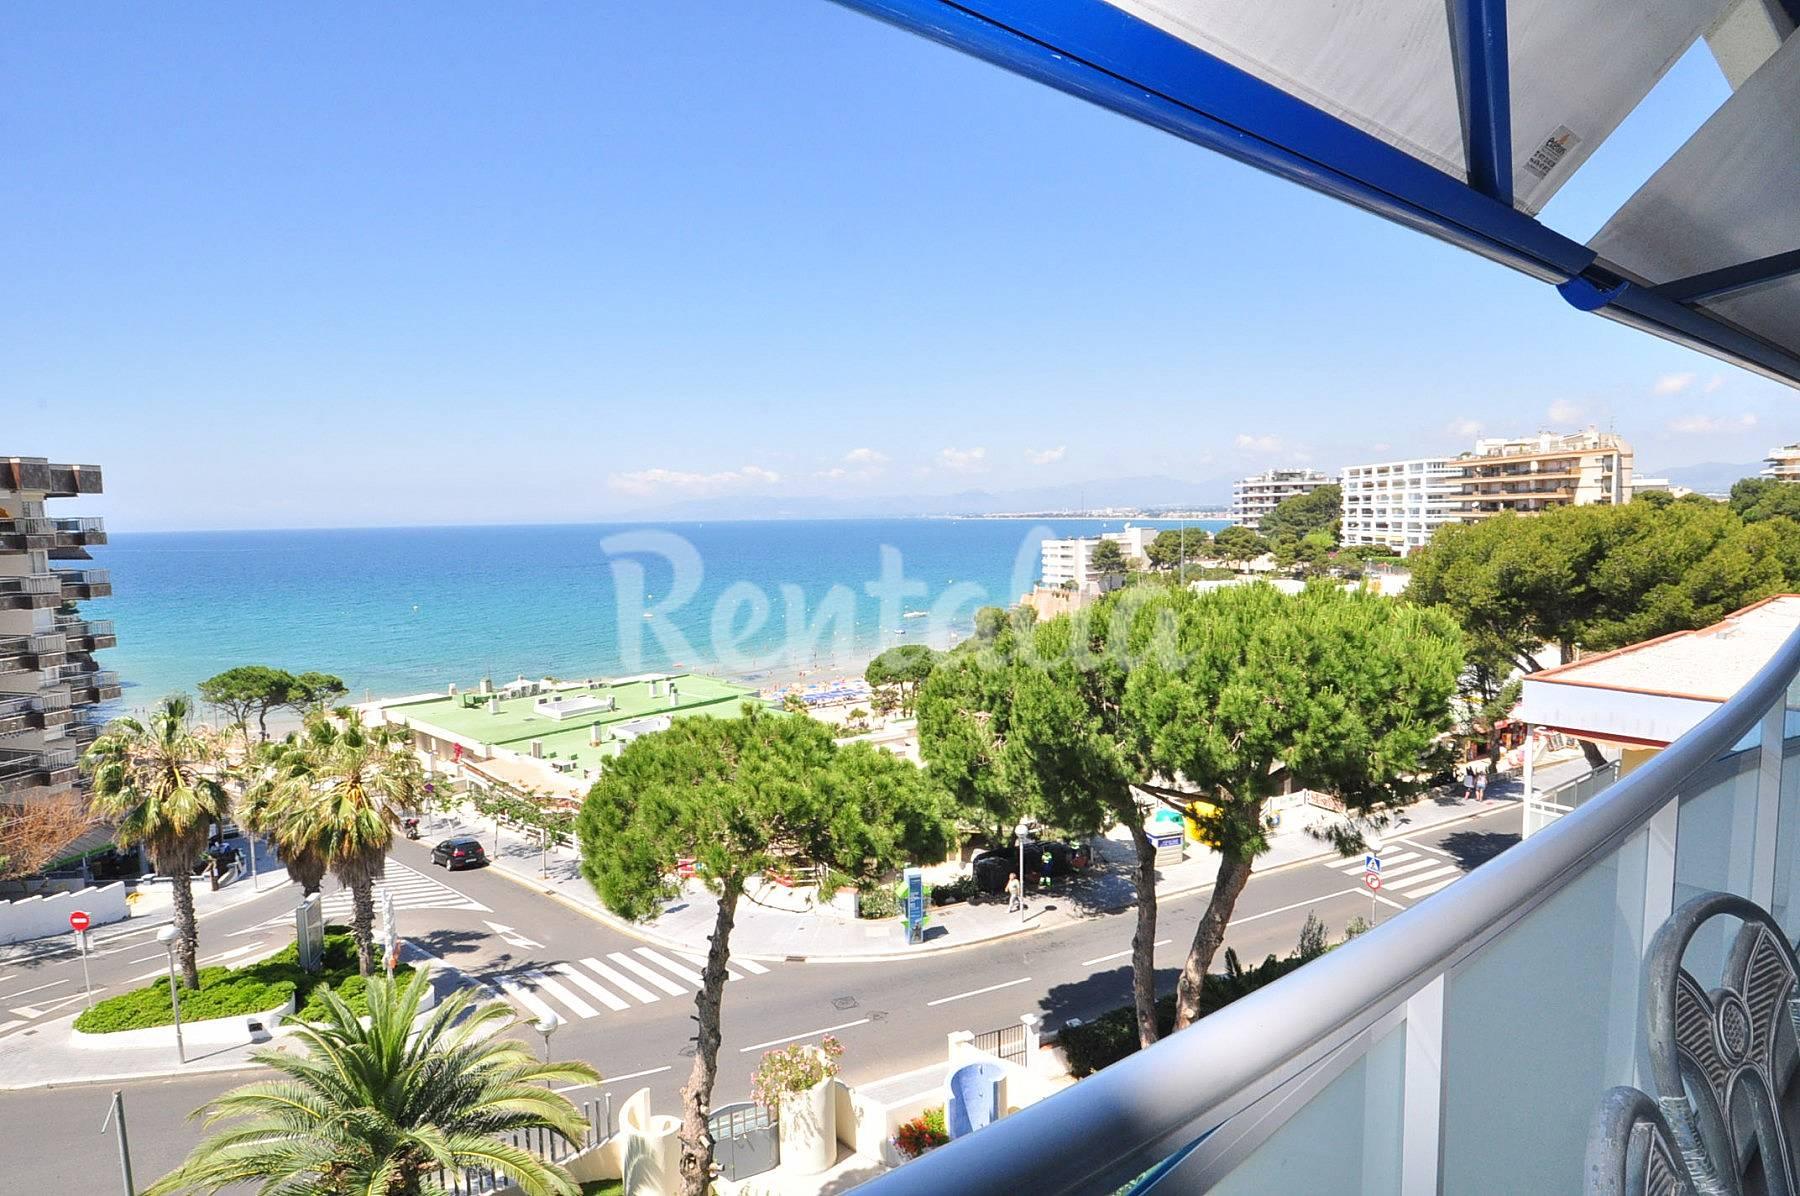 Alquiler de apartamento en salou playa 60 m salou tarragona costa dorada - Alquiler de apartamentos en playa ...